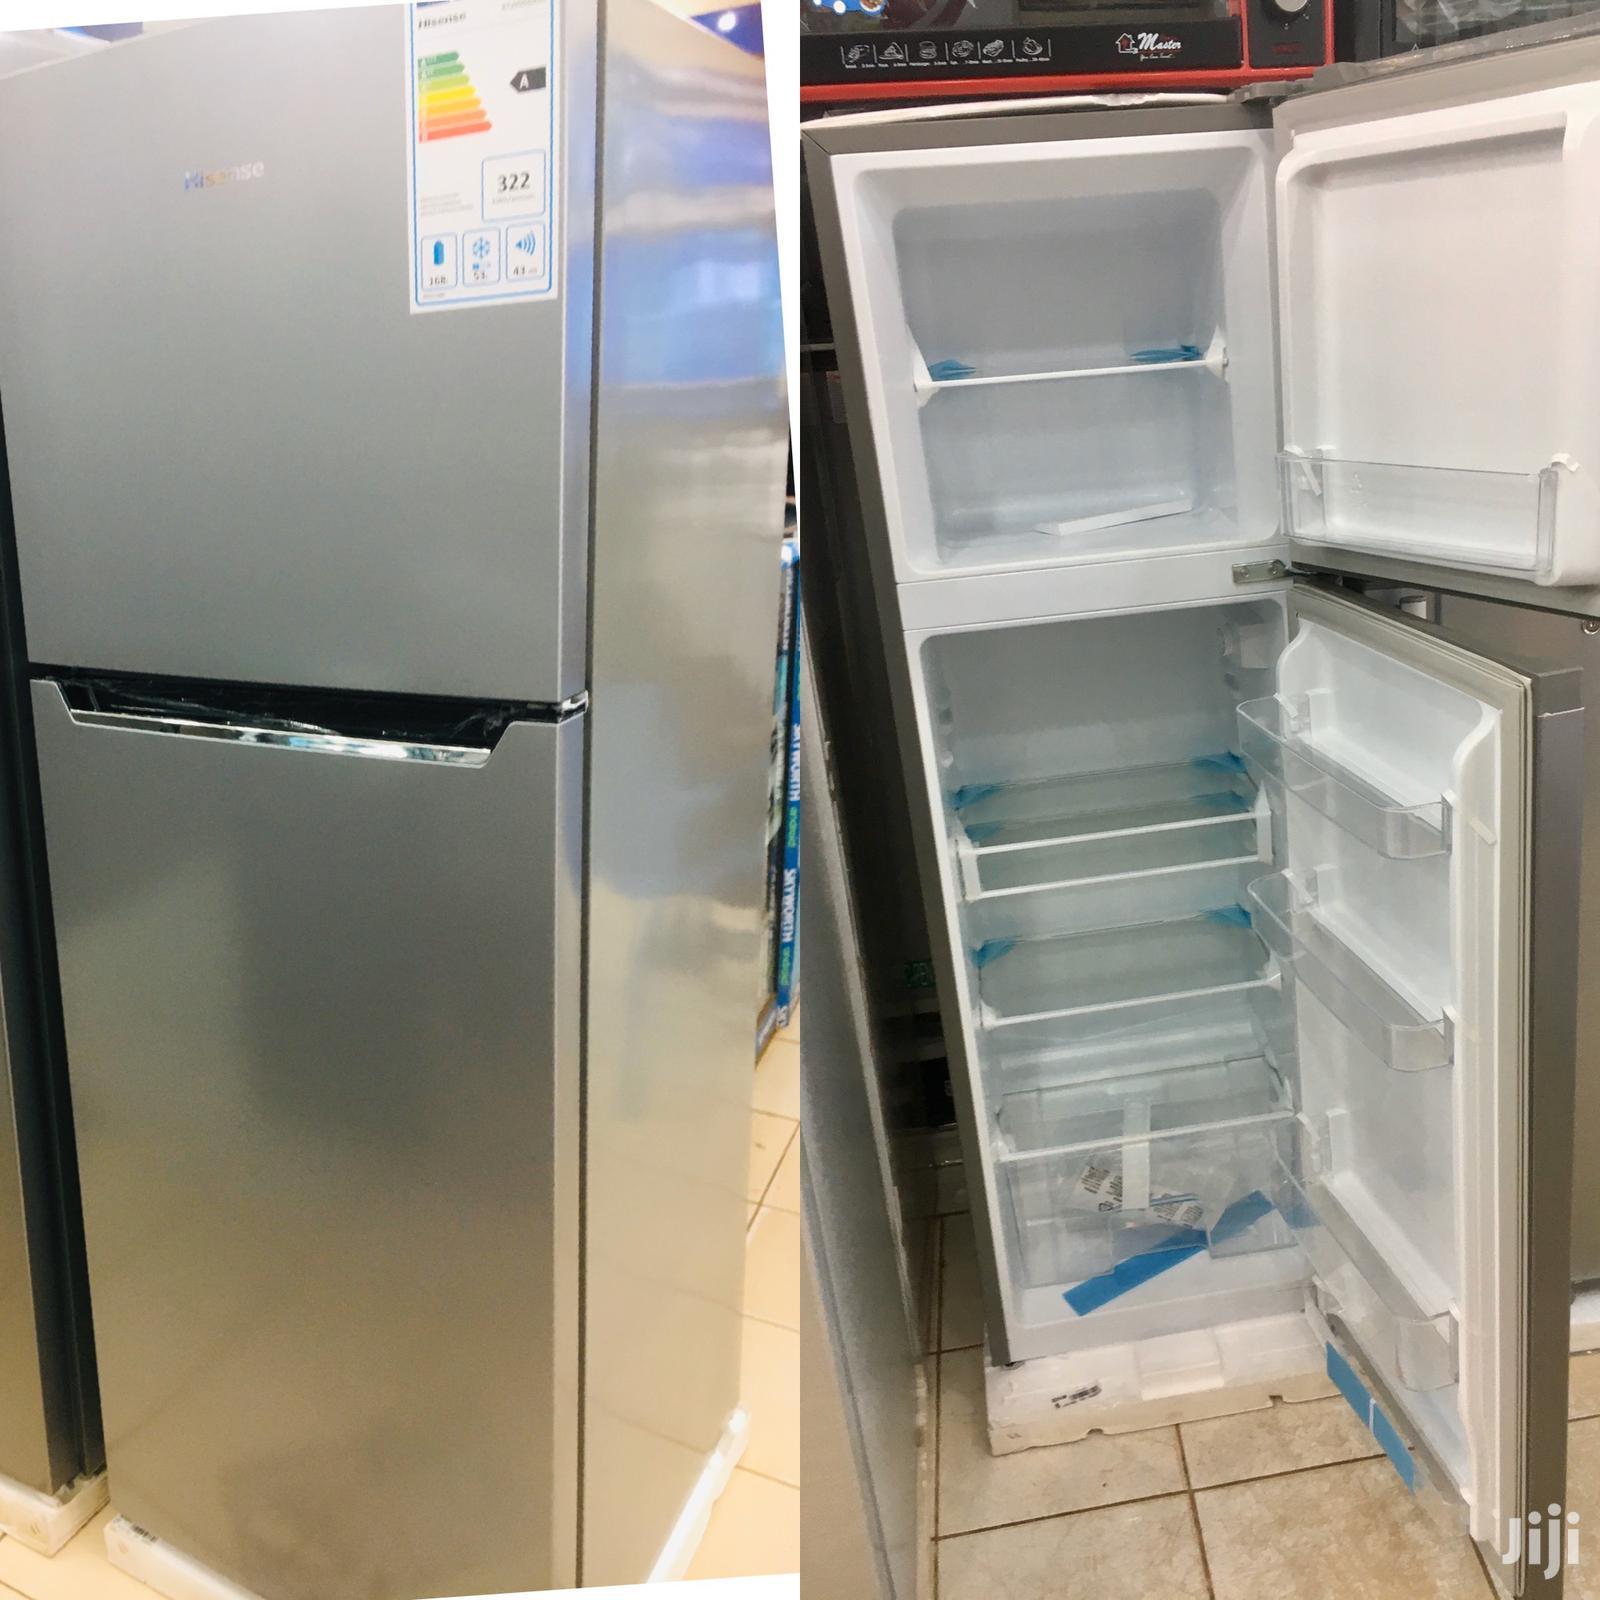 Hisense 295L Double Door Refrigerator Frost Free